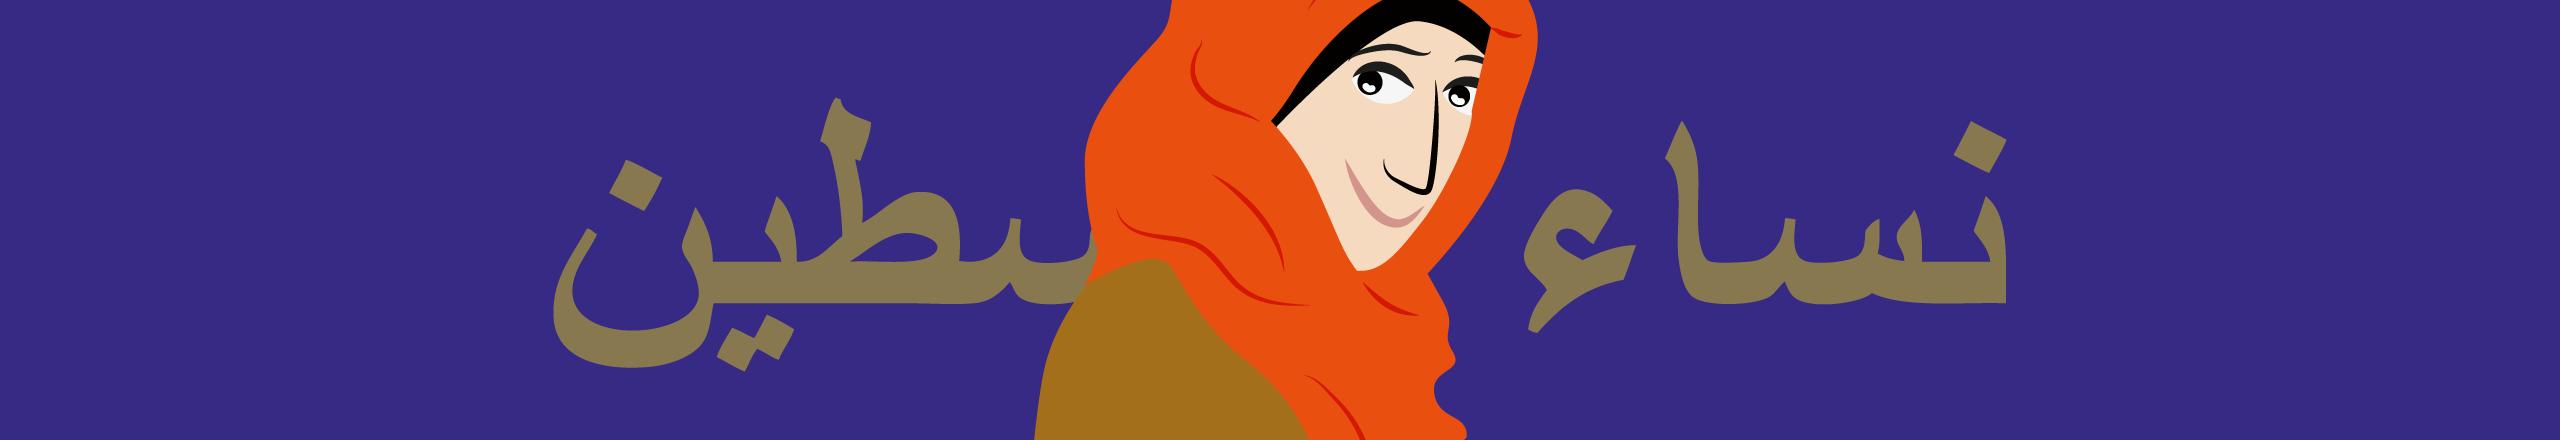 Femminile palestinese